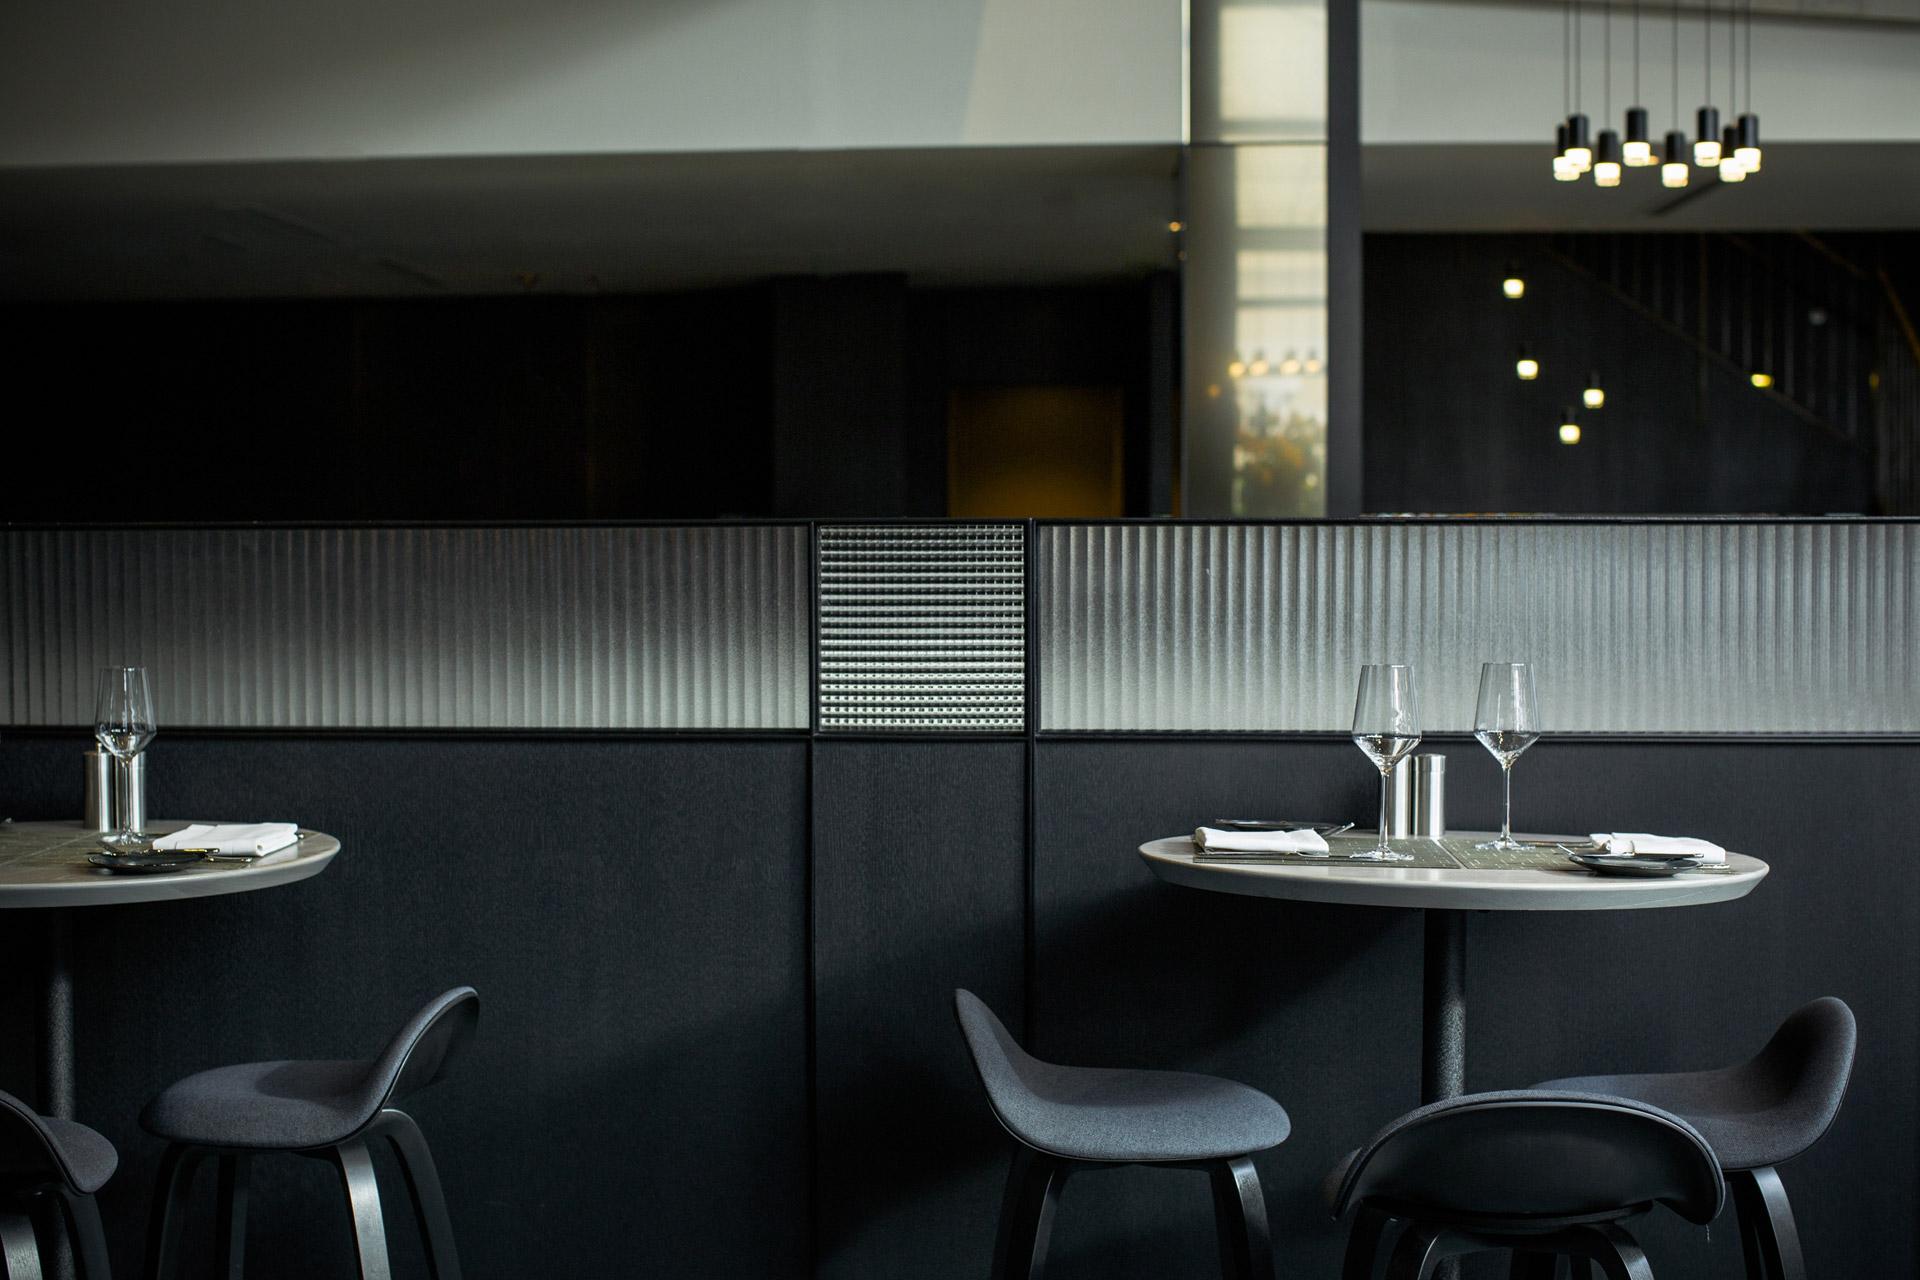 Volta restaurant design near me